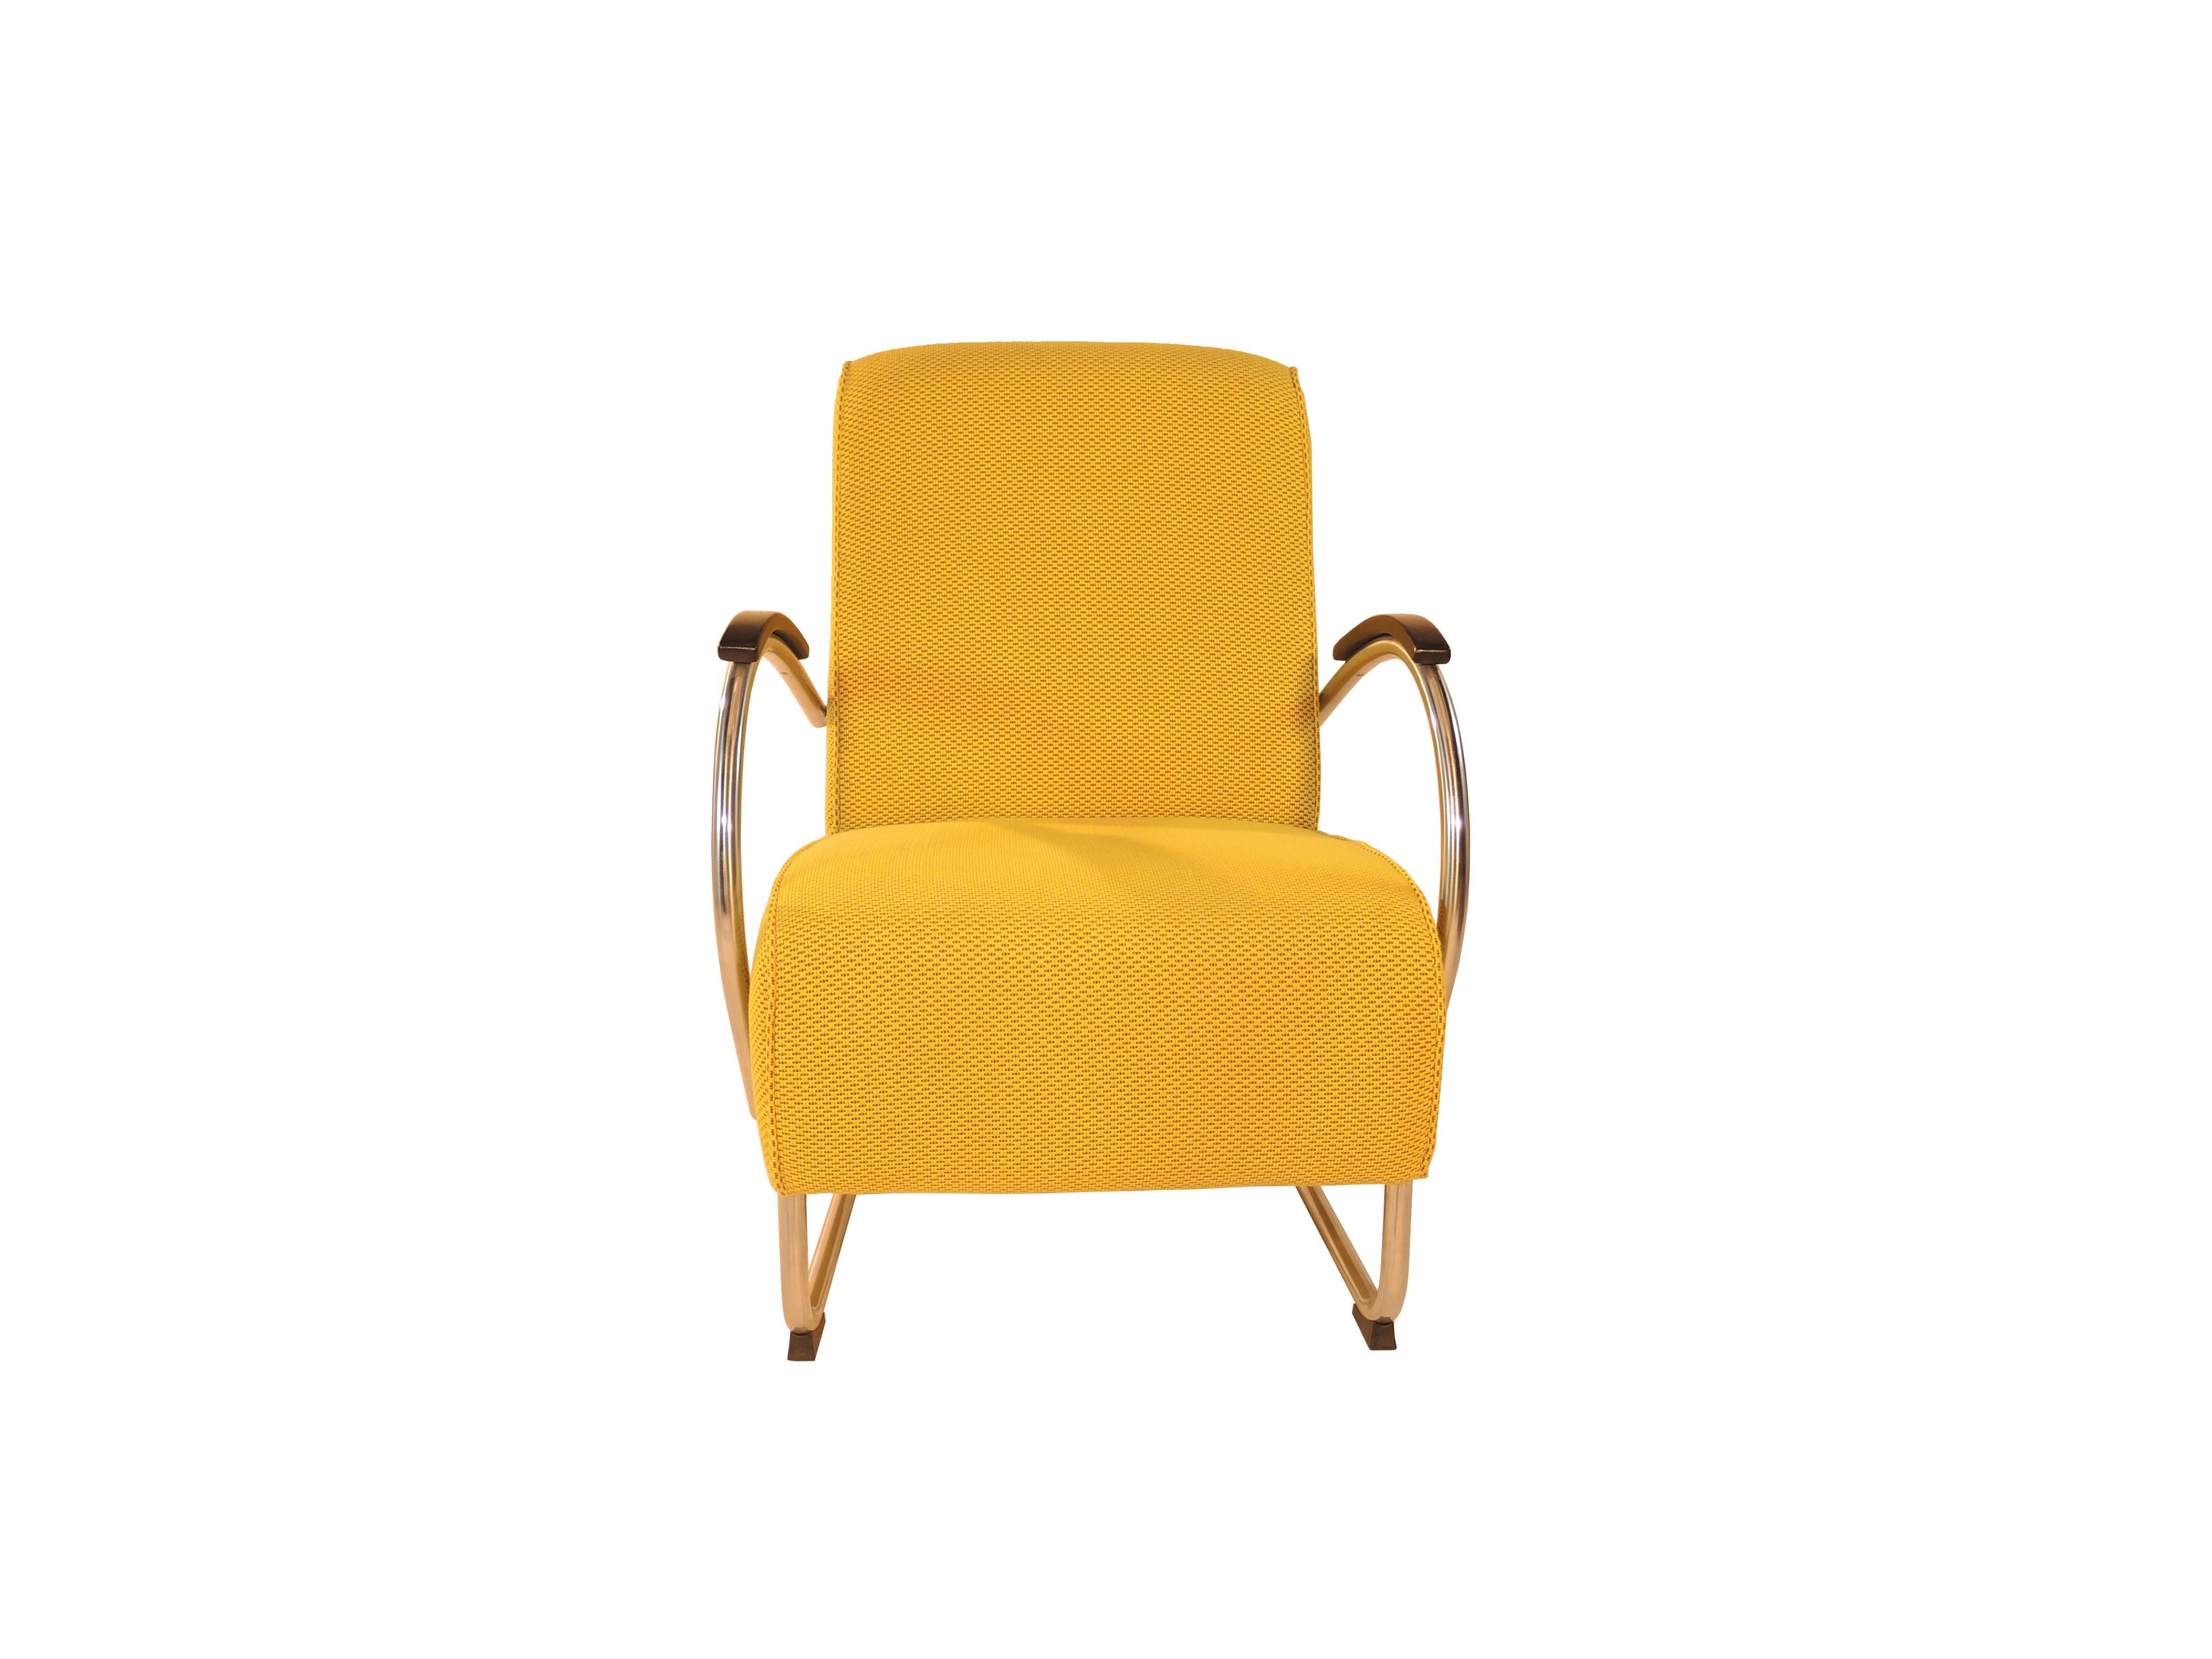 Retro - Design fauteuil